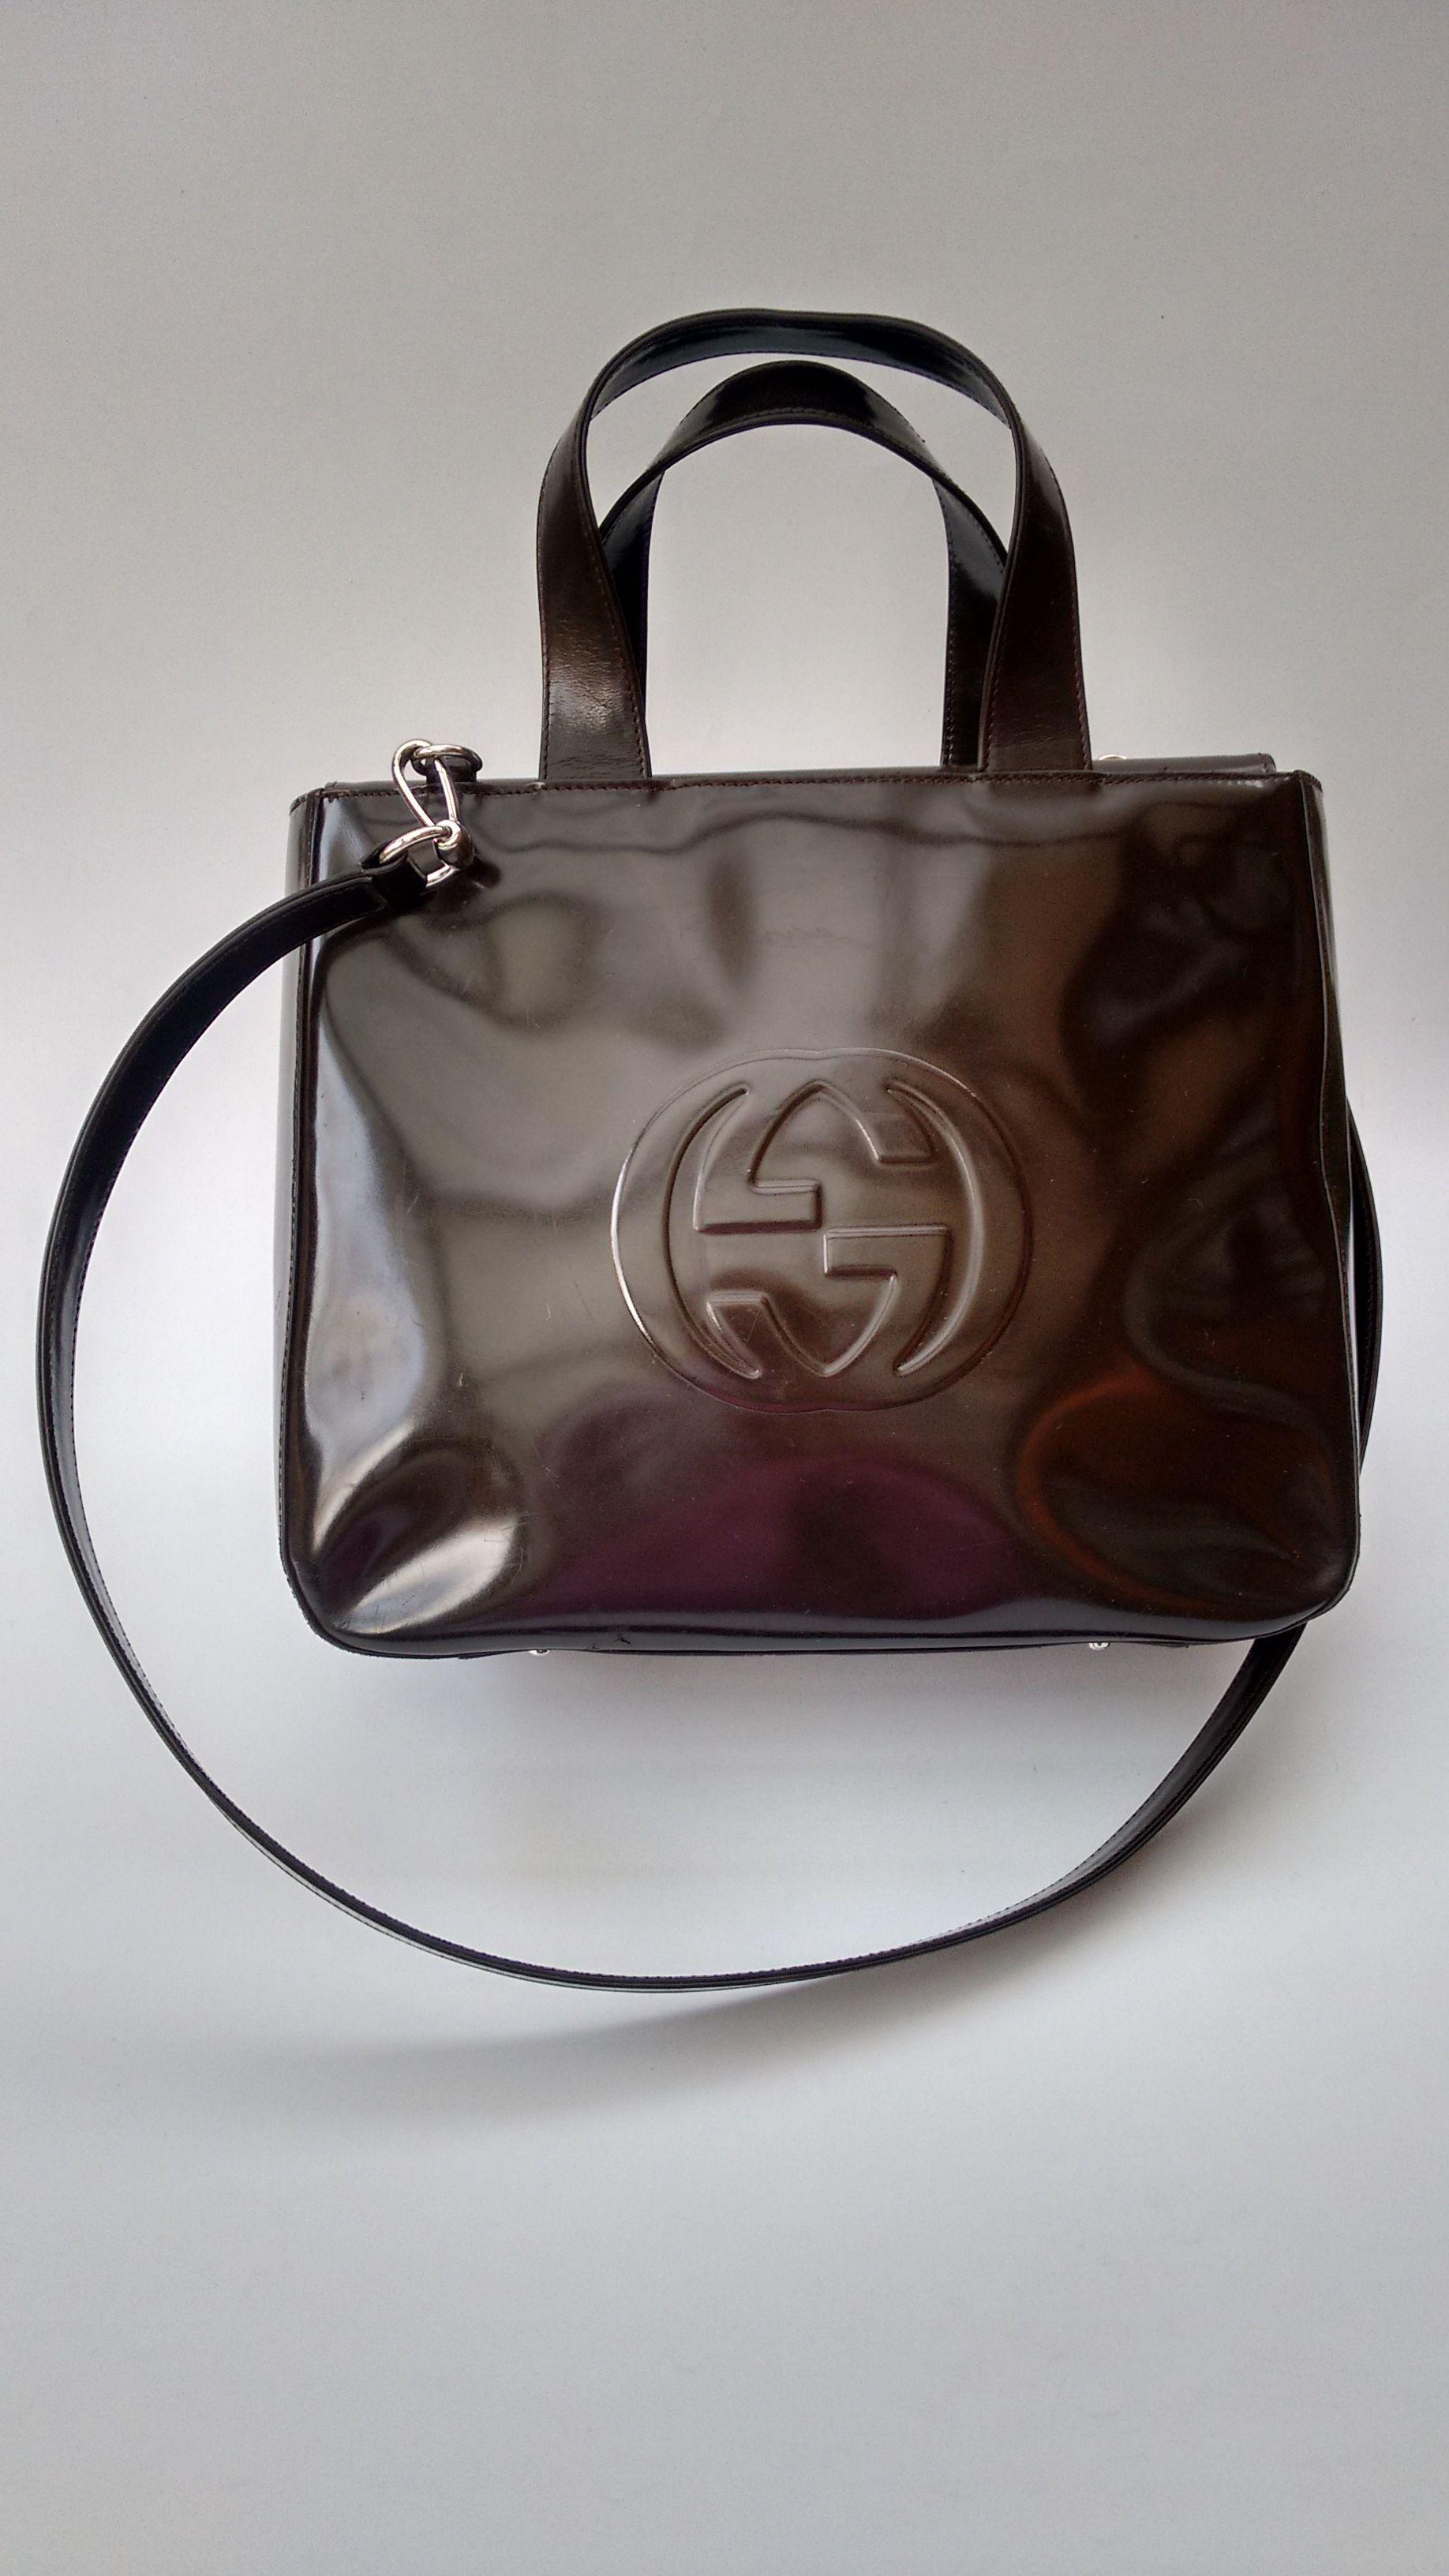 185b99f3e327 GUCCI Bag . Gucci Vintage Brown Leather Shoulder Bag . Italian Designer  Purse - Tom Ford era.